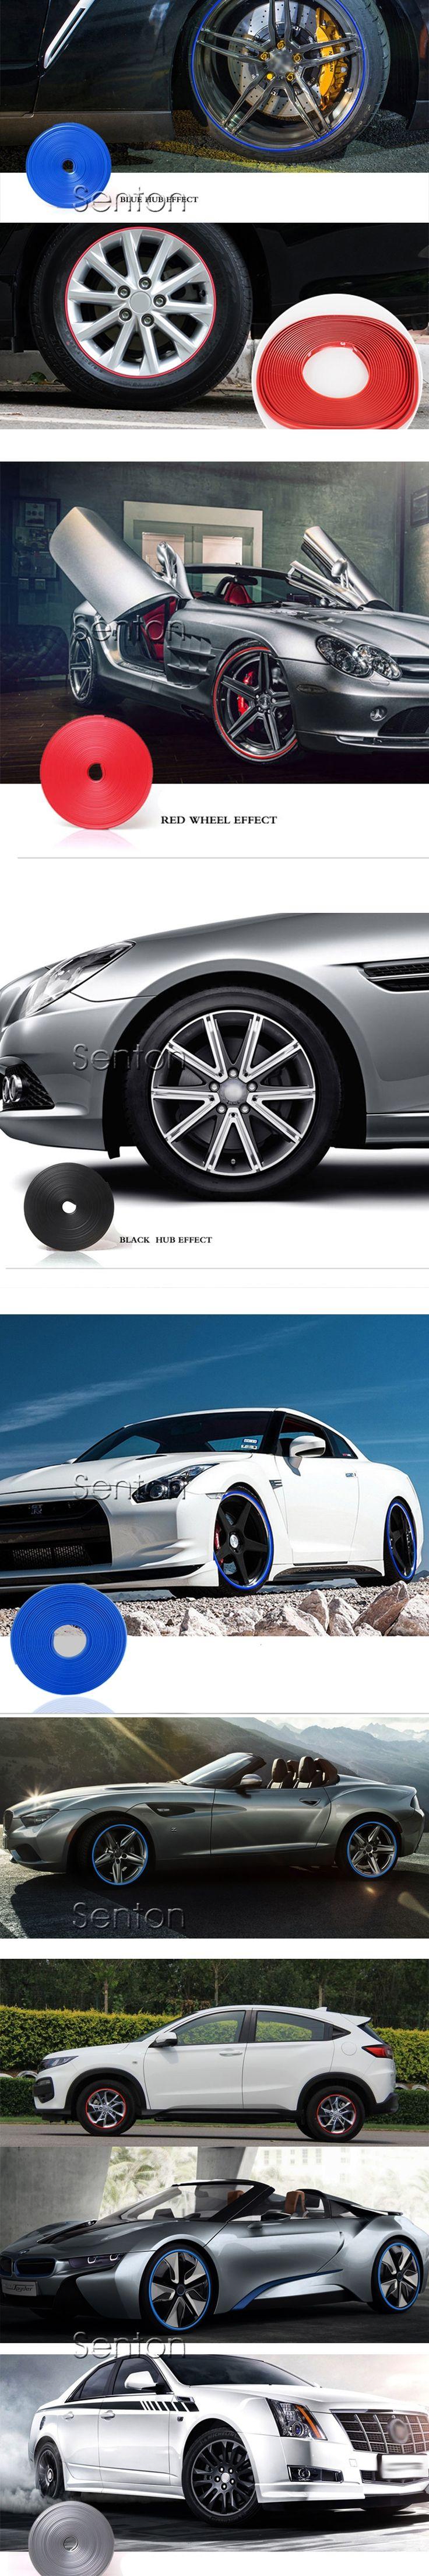 Car Wheel Hub Tire Protector Sticker For Mitsubishi ASX Lancer 10 Outlander Pajero Subaru Forester Impreza XV Citroen C4 C5 C3